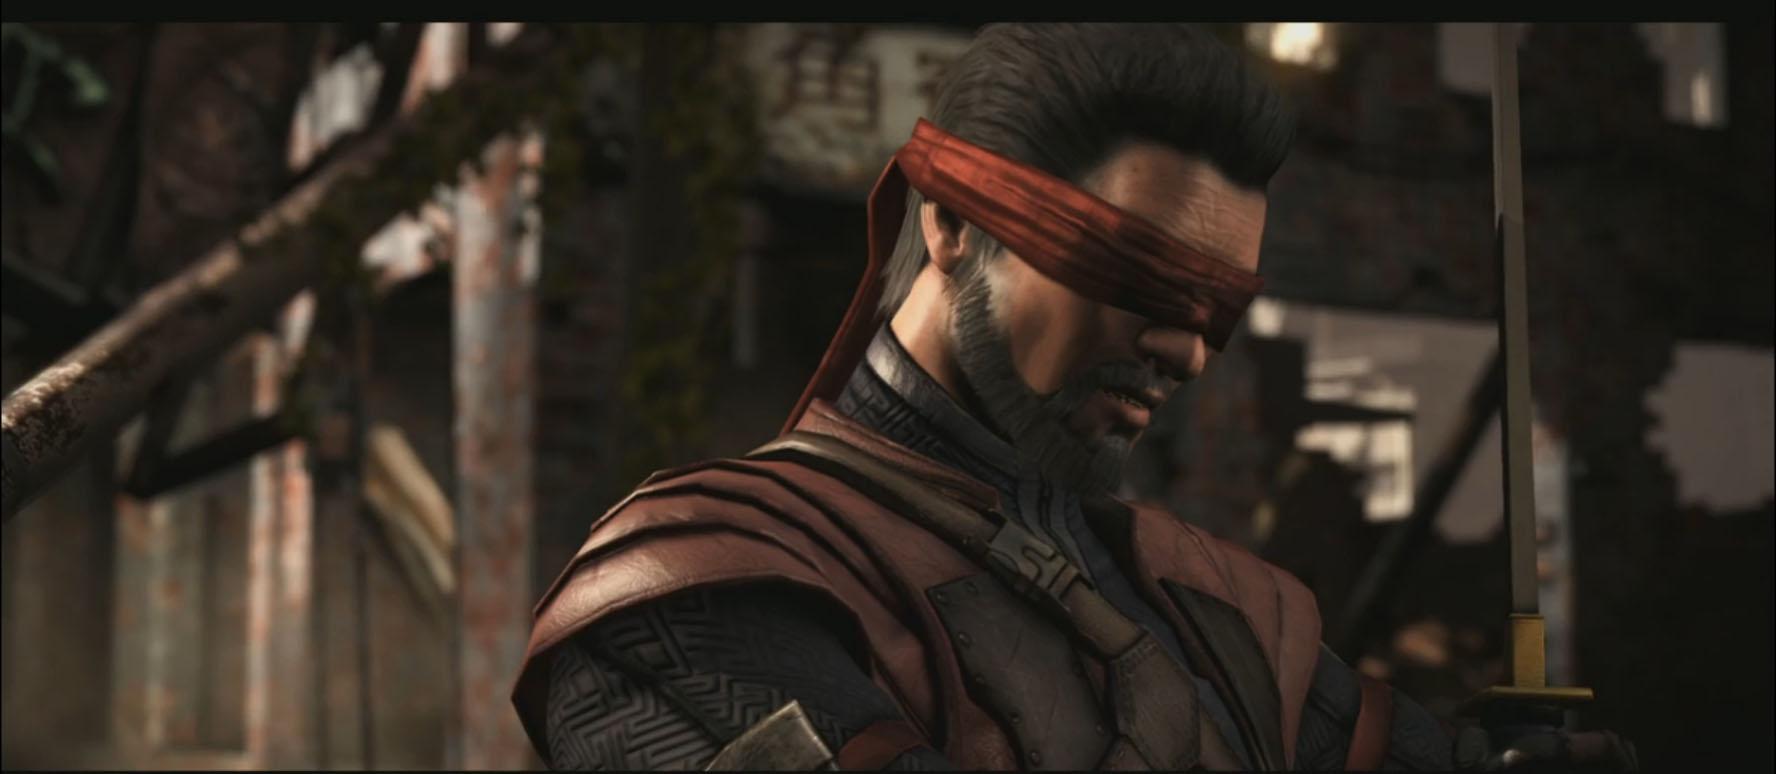 Mortal Kombat X Throws Spirits And Bombs With Kenshi And